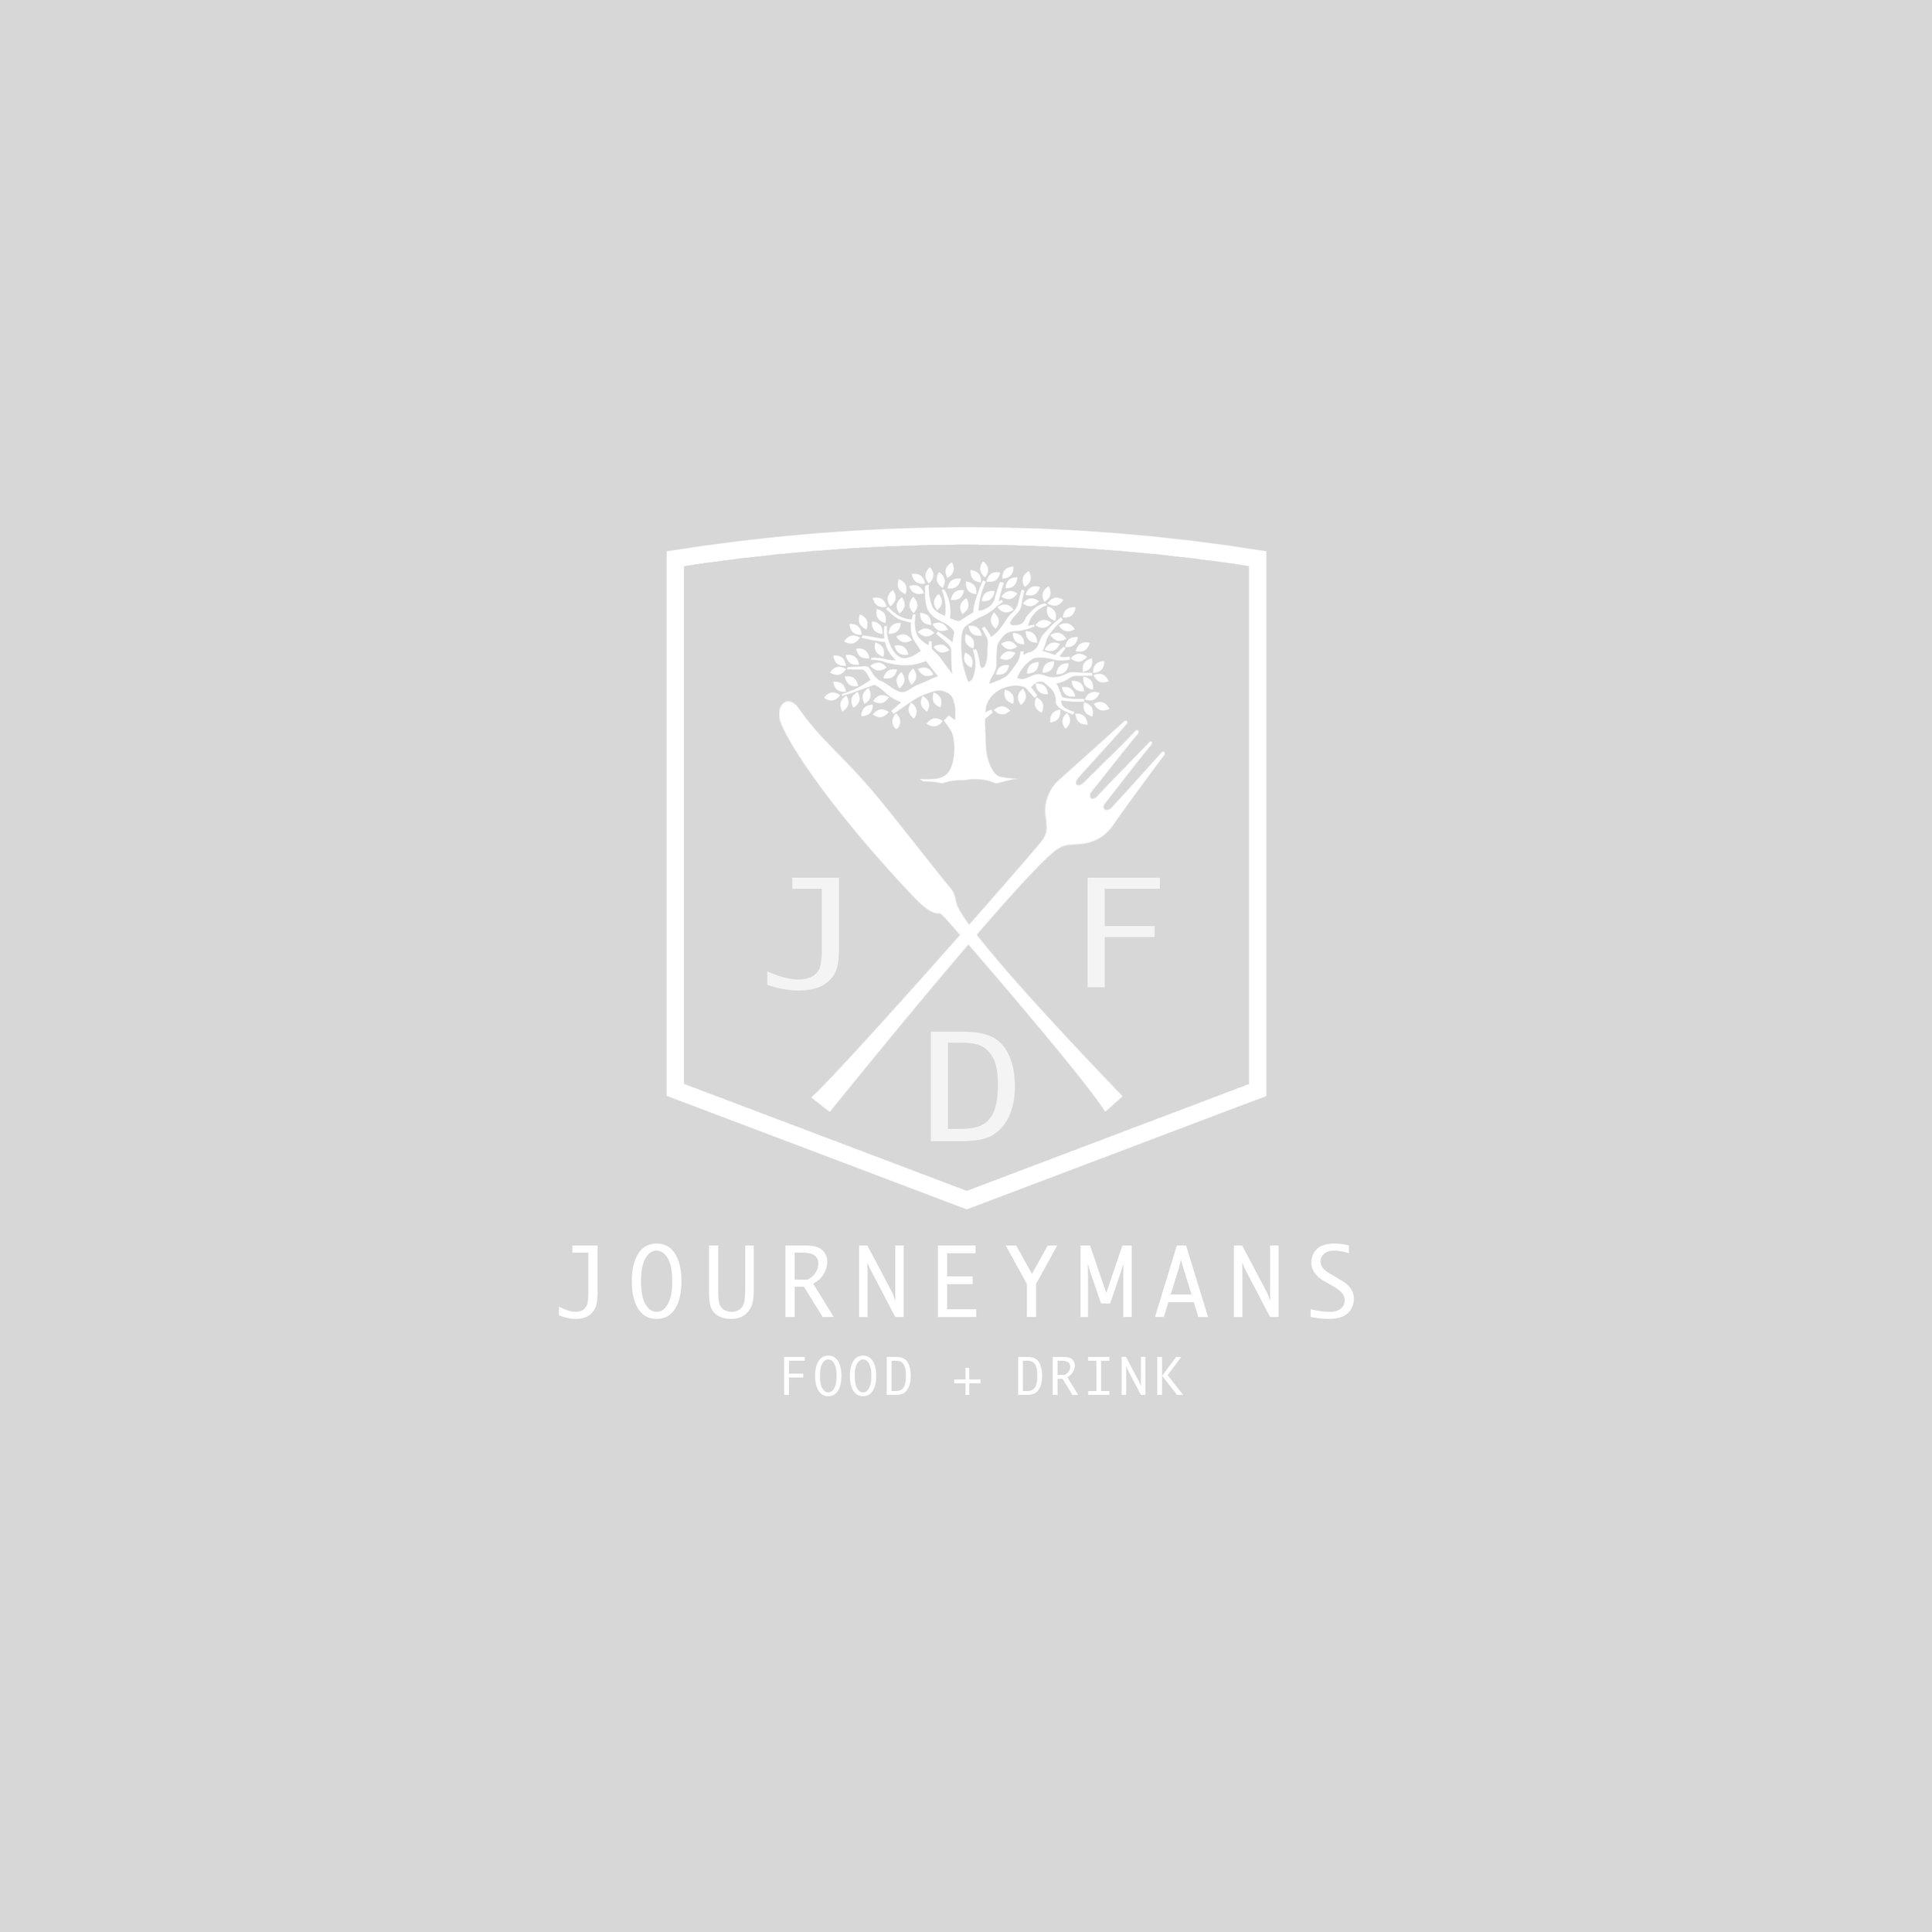 Journeyman's Food & Drink